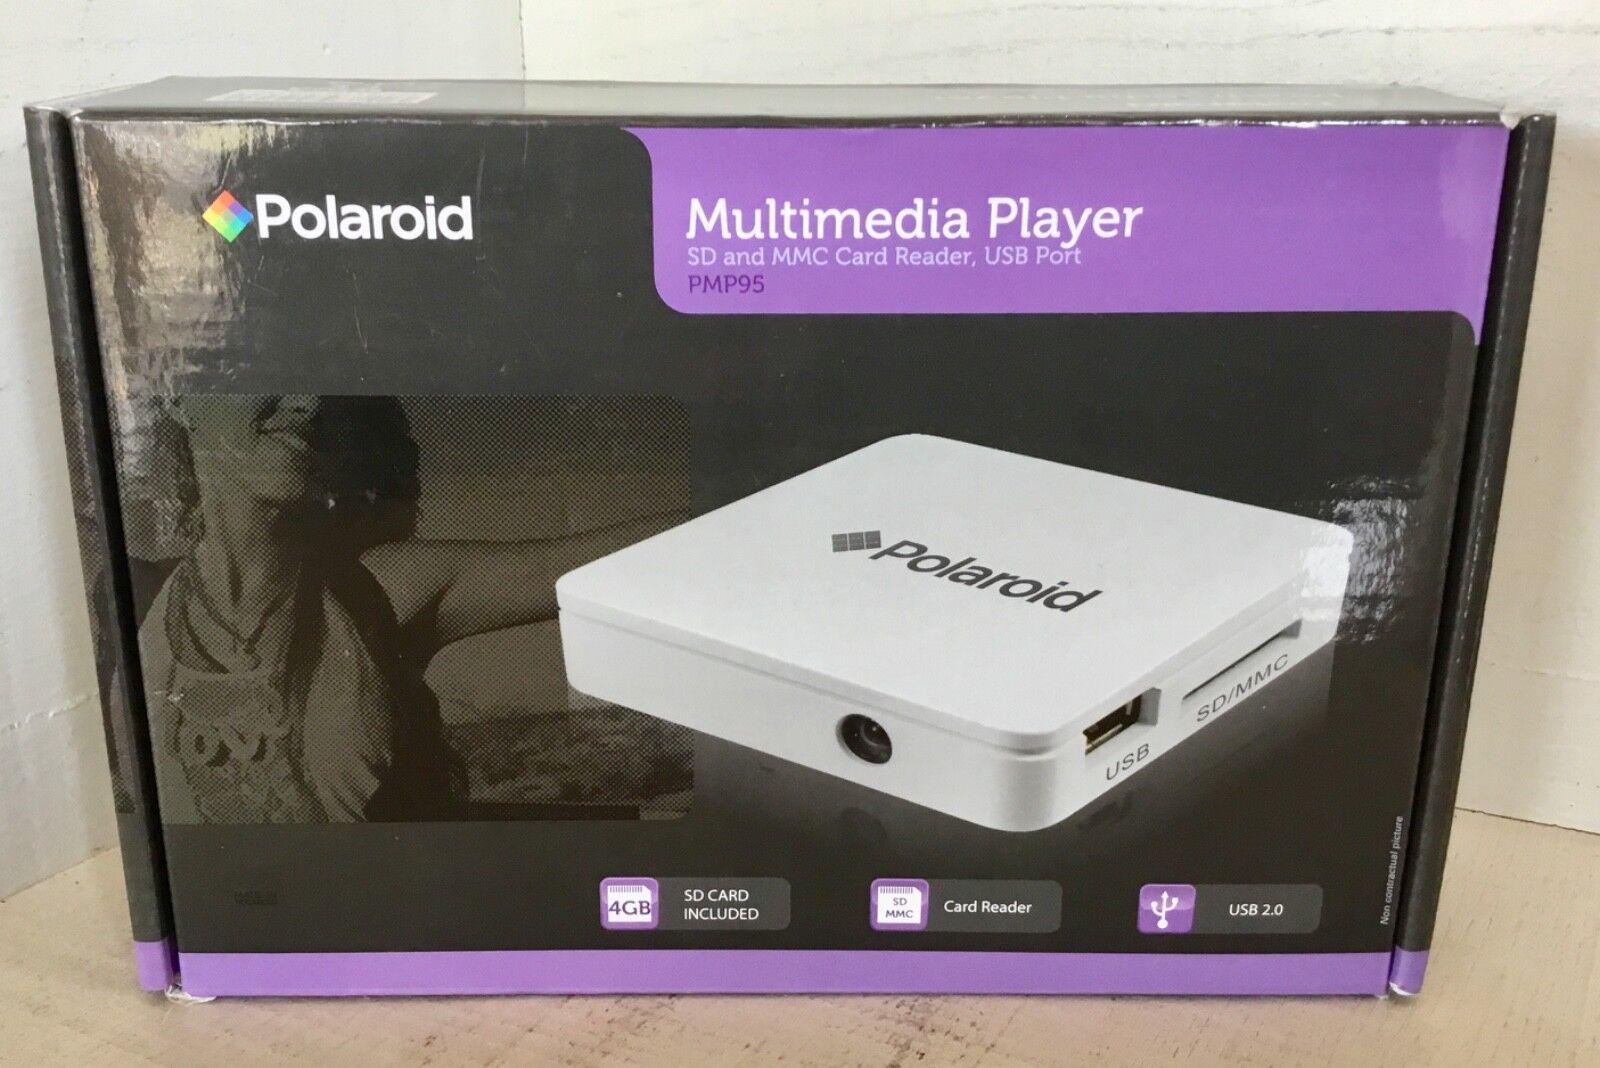 POLAROID PMP95 Multimedia player SD MMC card reader USB port NEW IN BOX